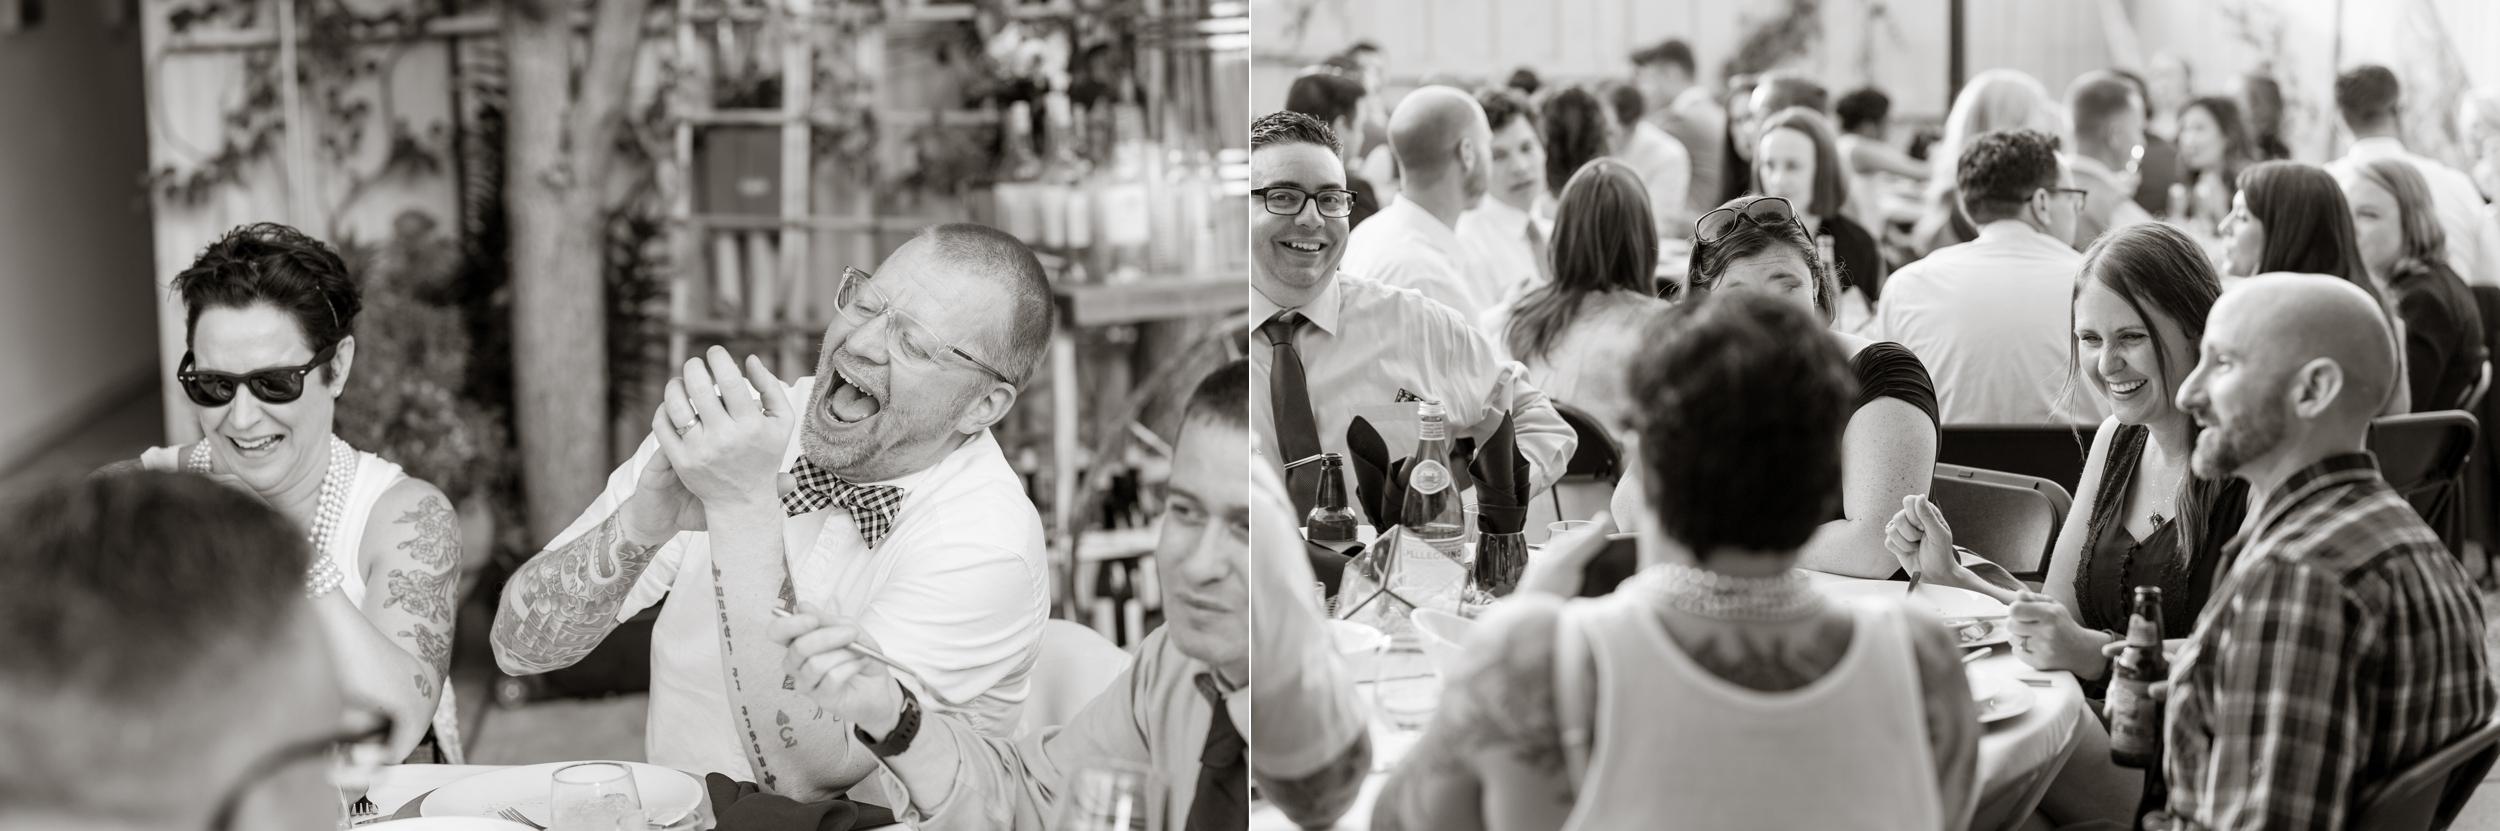 studio-333-sausalito-wedding-photographer-vc35.jpg